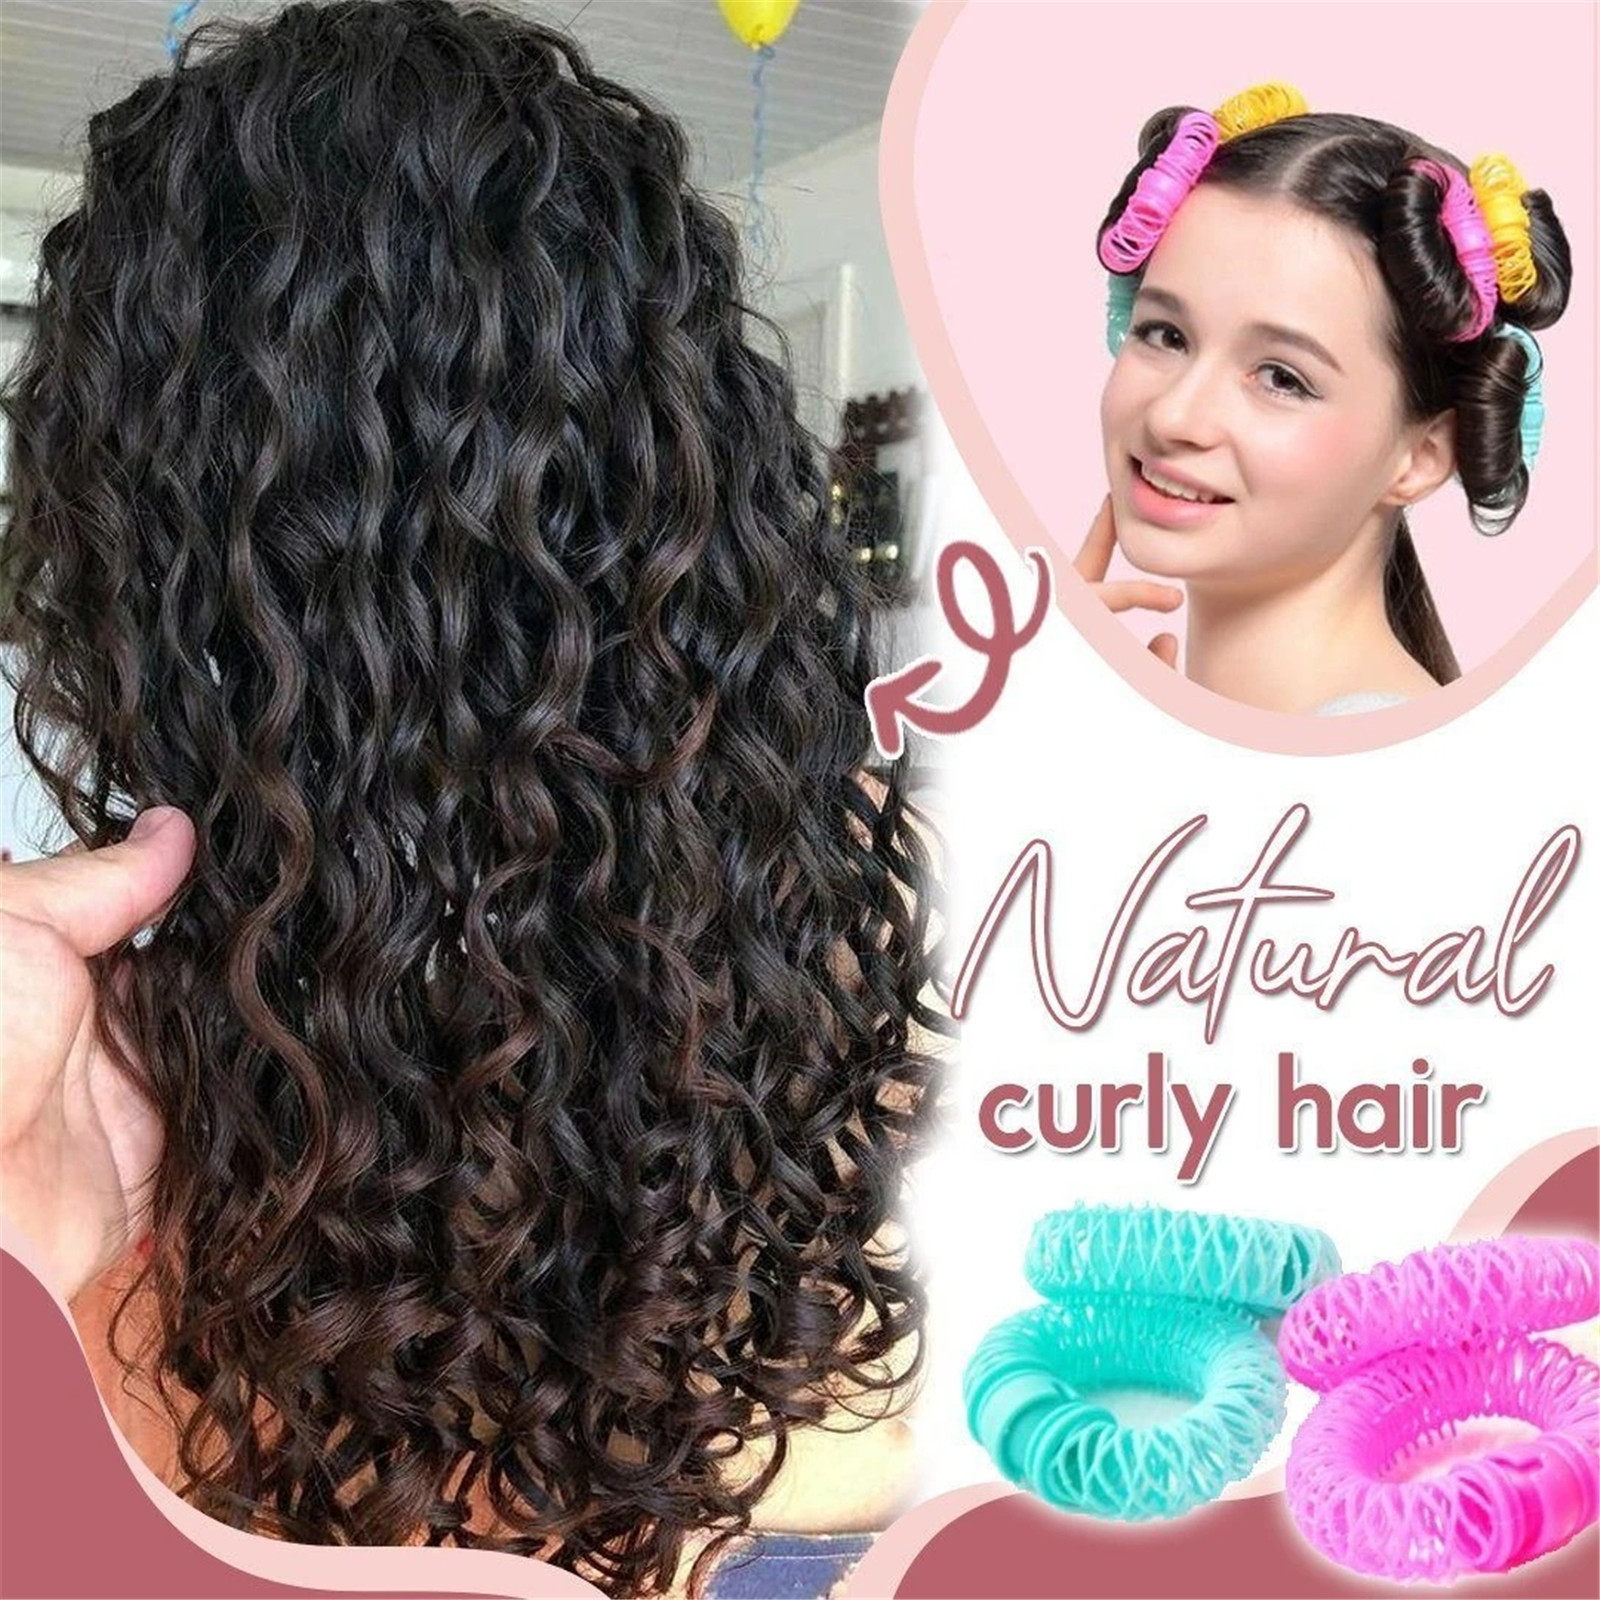 Donut-rulos mágicos de plástico en espiral para rizar cabello, rulos naturales para rizar cabello